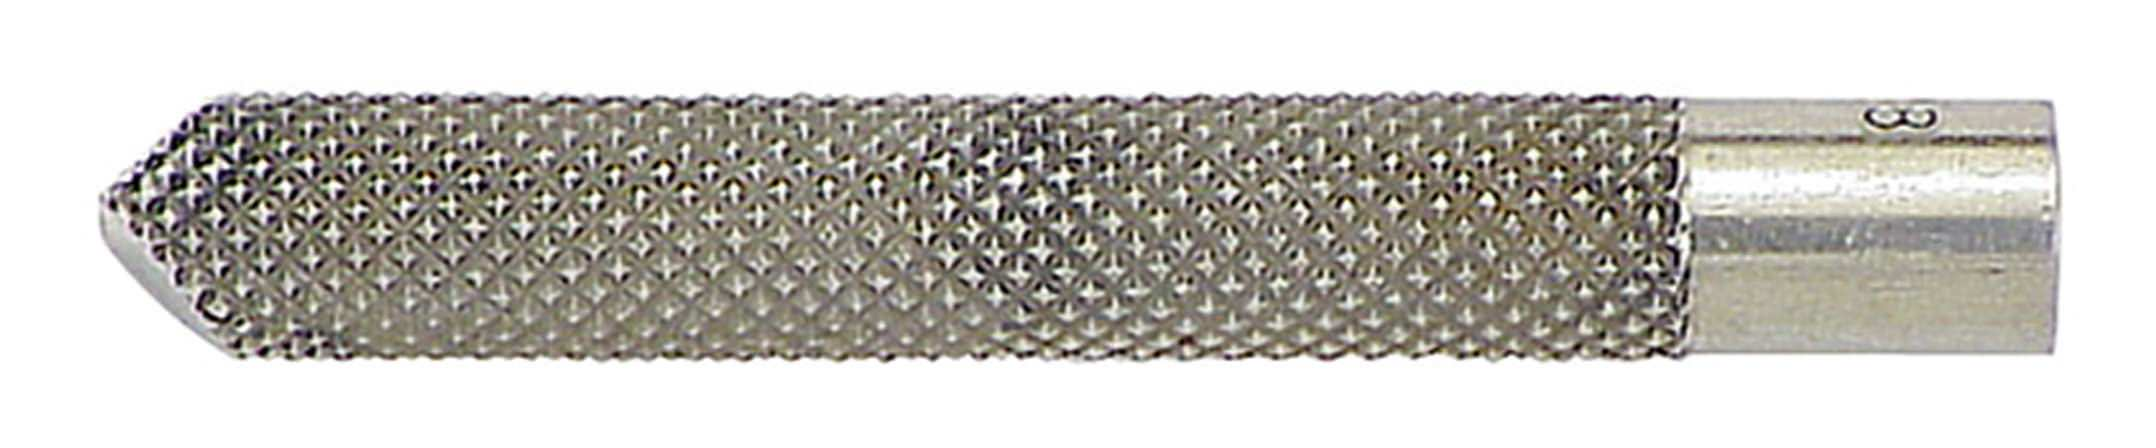 Upat Innengewindehülse IST M10 mm Edelstahl A4 - 513725 (VPE: 10 Stück)